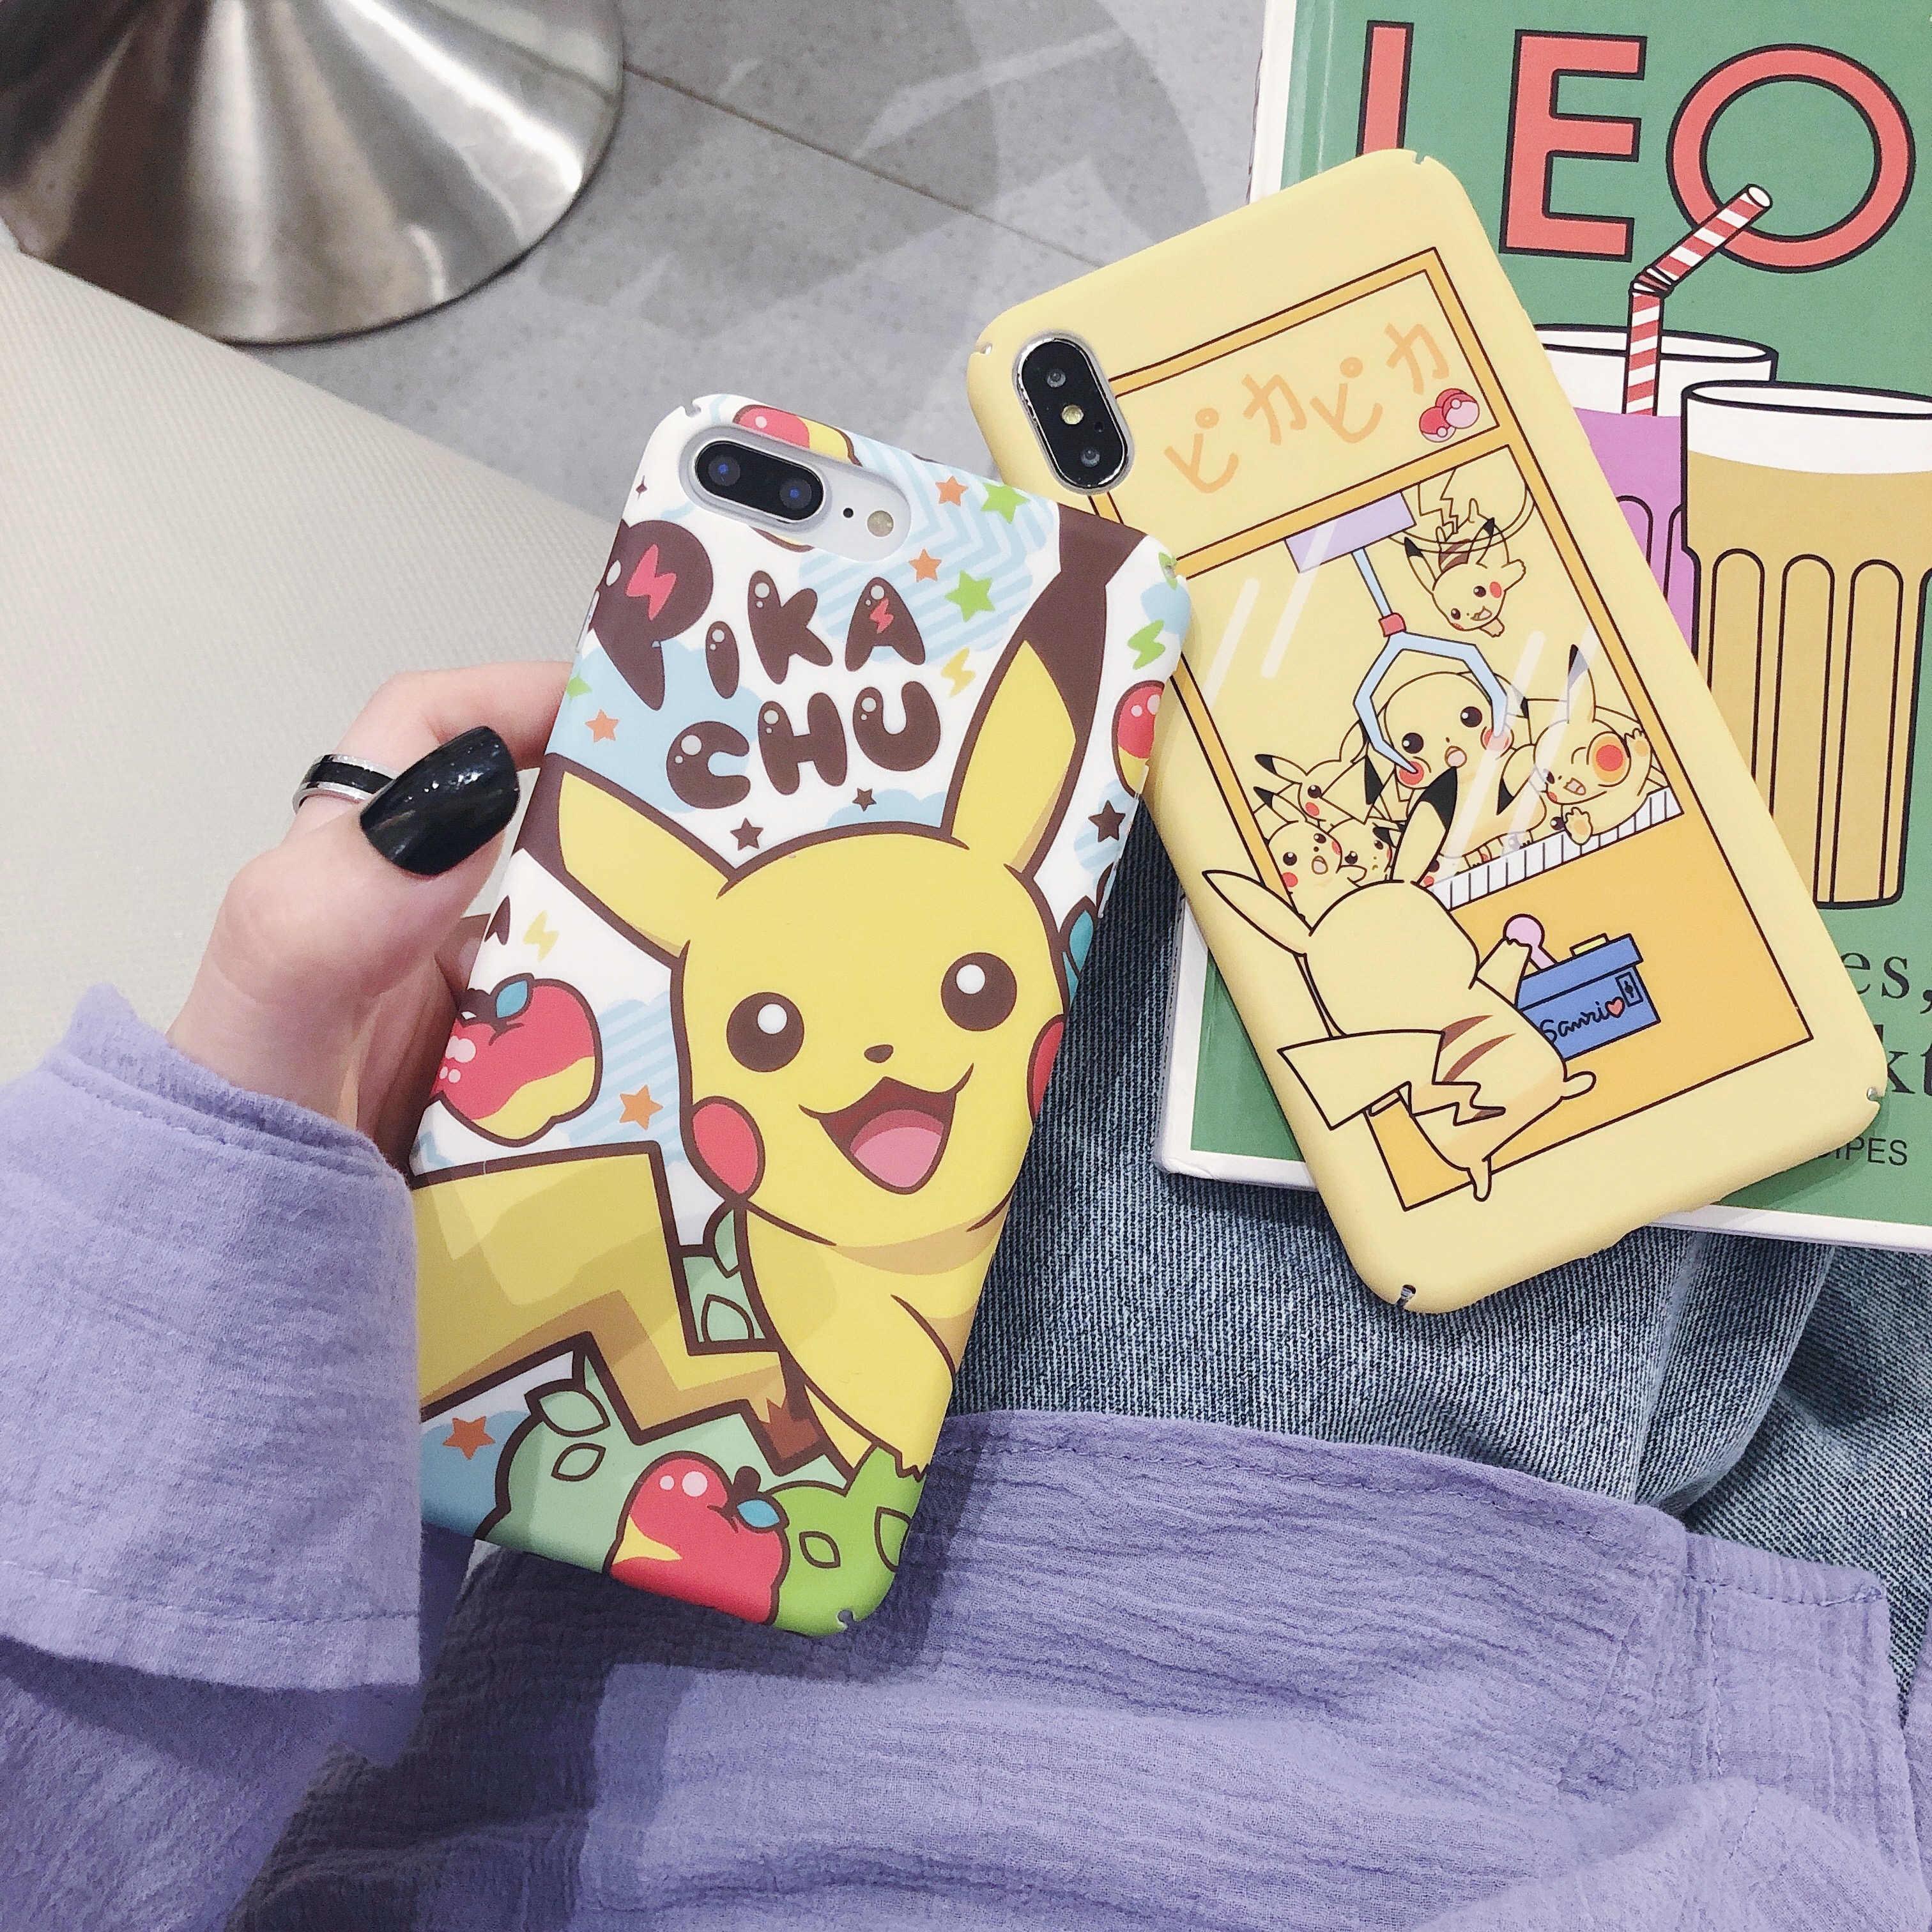 Чехол Pokemons picachu для iphone 6 7 8Plus X XS MAX XR 11 11pro